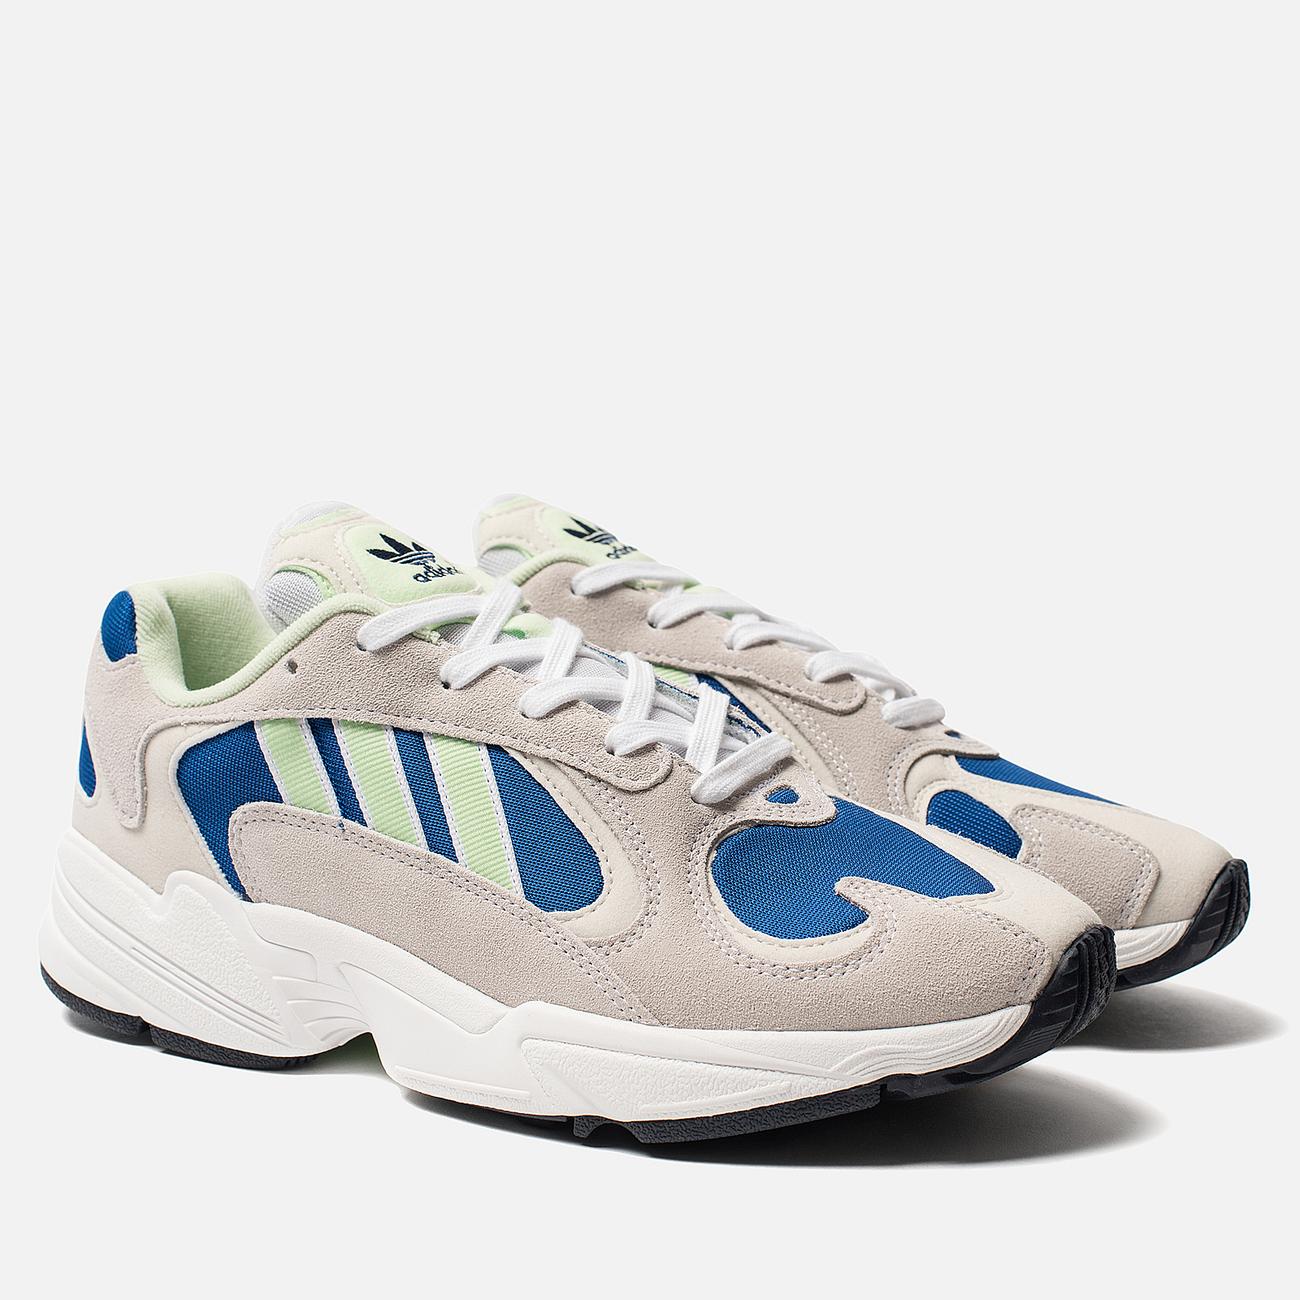 Мужские кроссовки adidas Originals Yung-1 White/Glow Green/Collegiate Royal